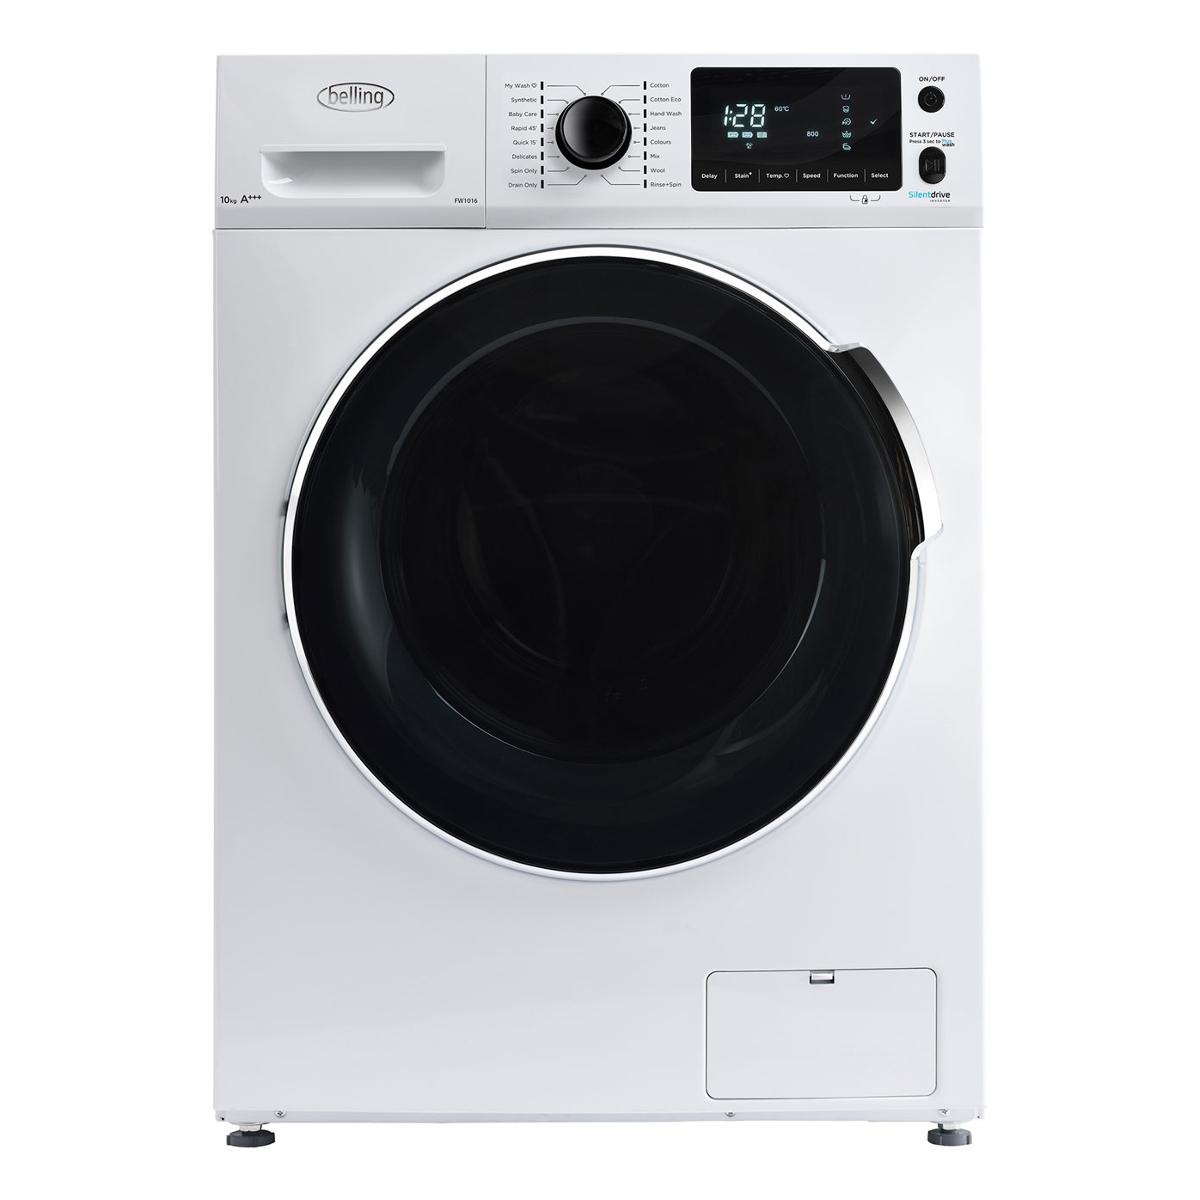 Belling Fw1016whi Freestanding Washing Machine With 10kg